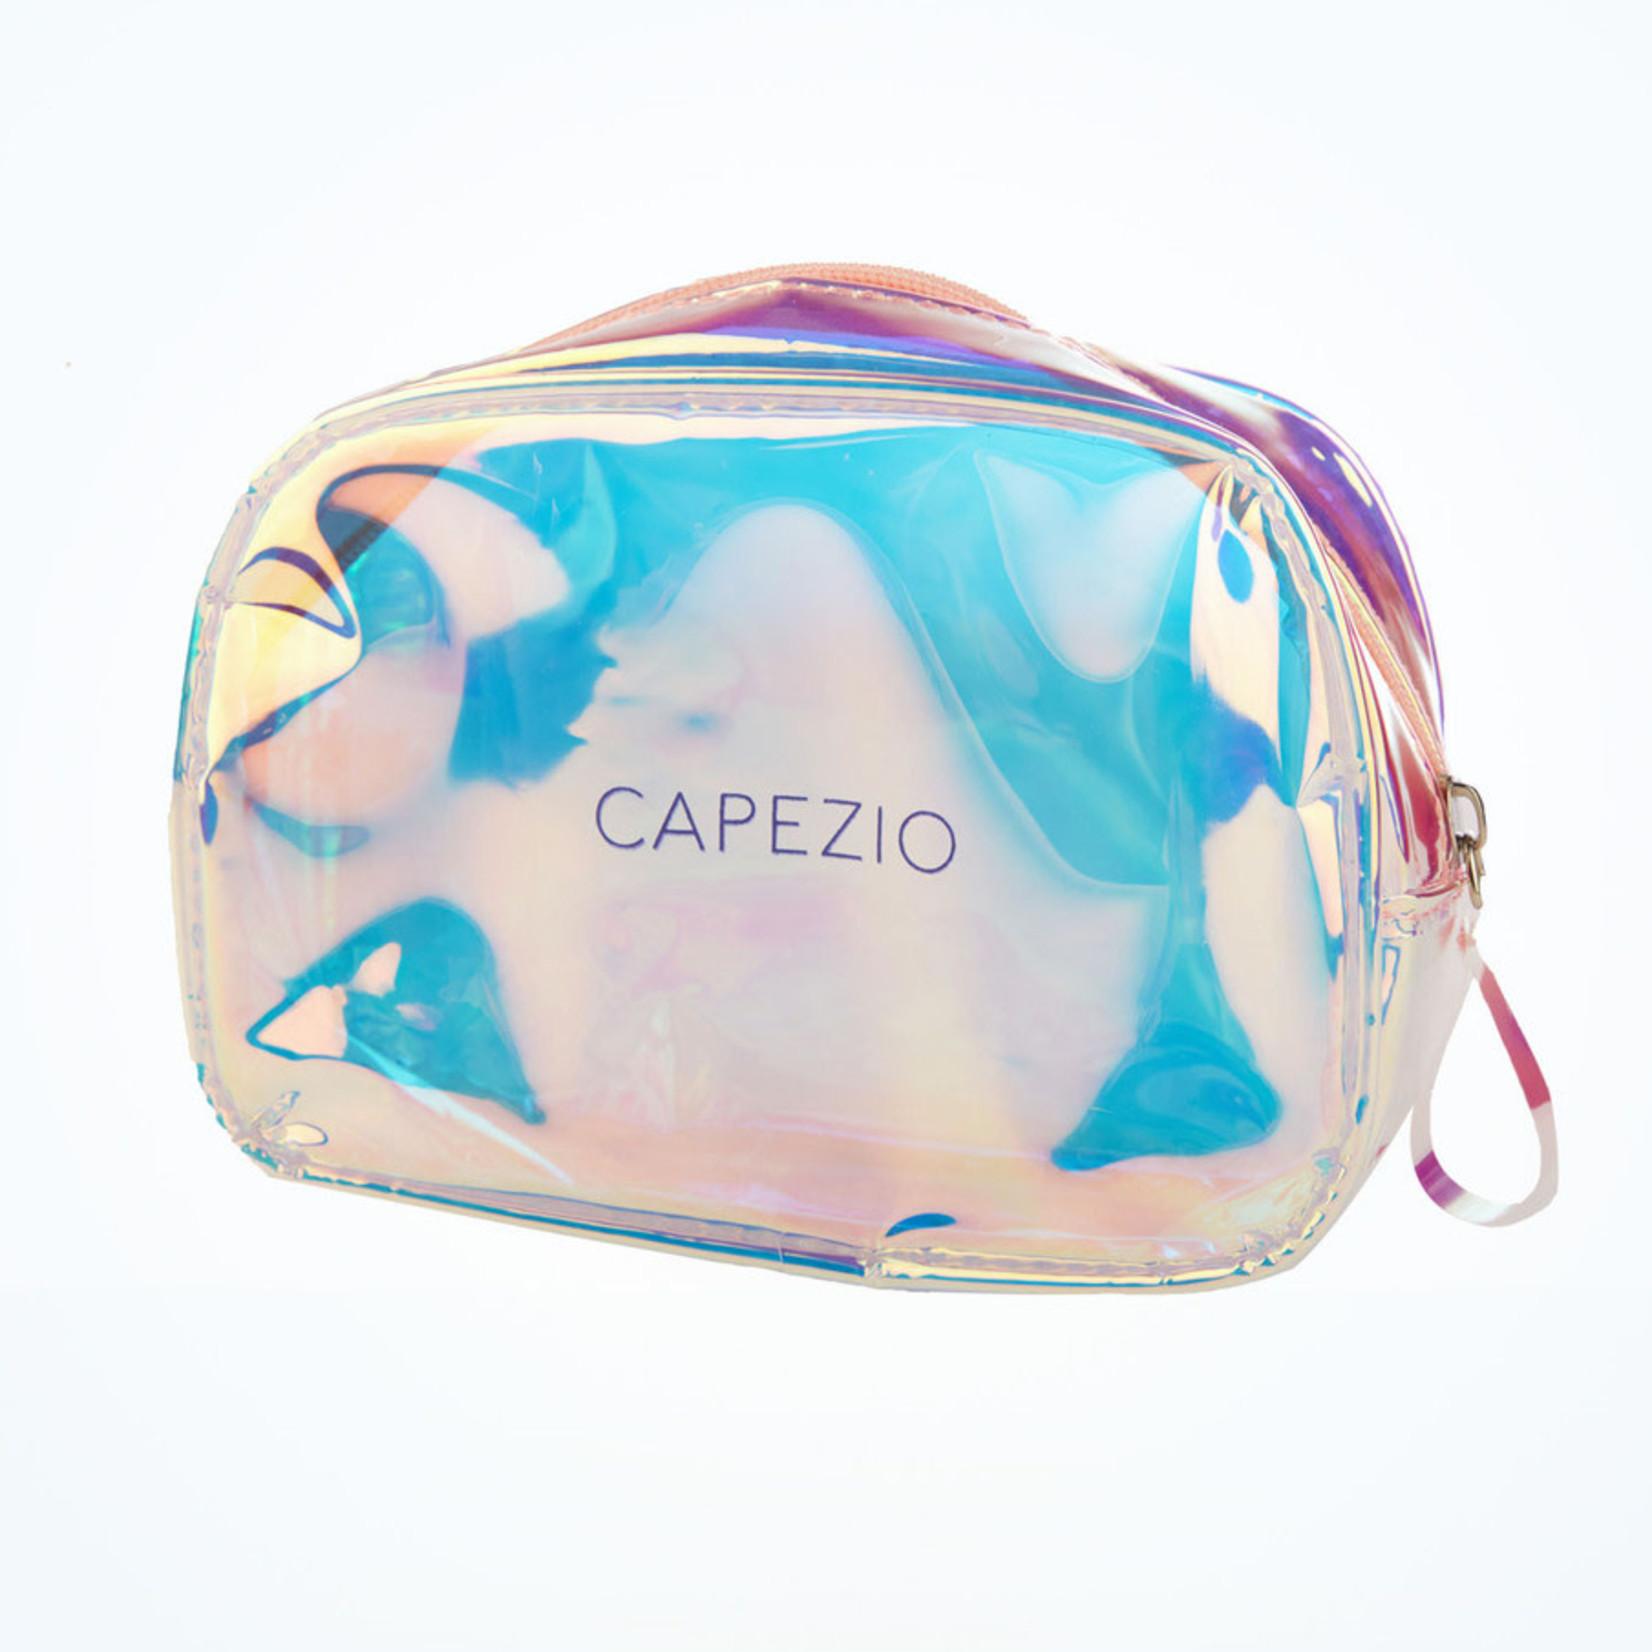 Capezio Capezio B226 Holographic Makeup Bag